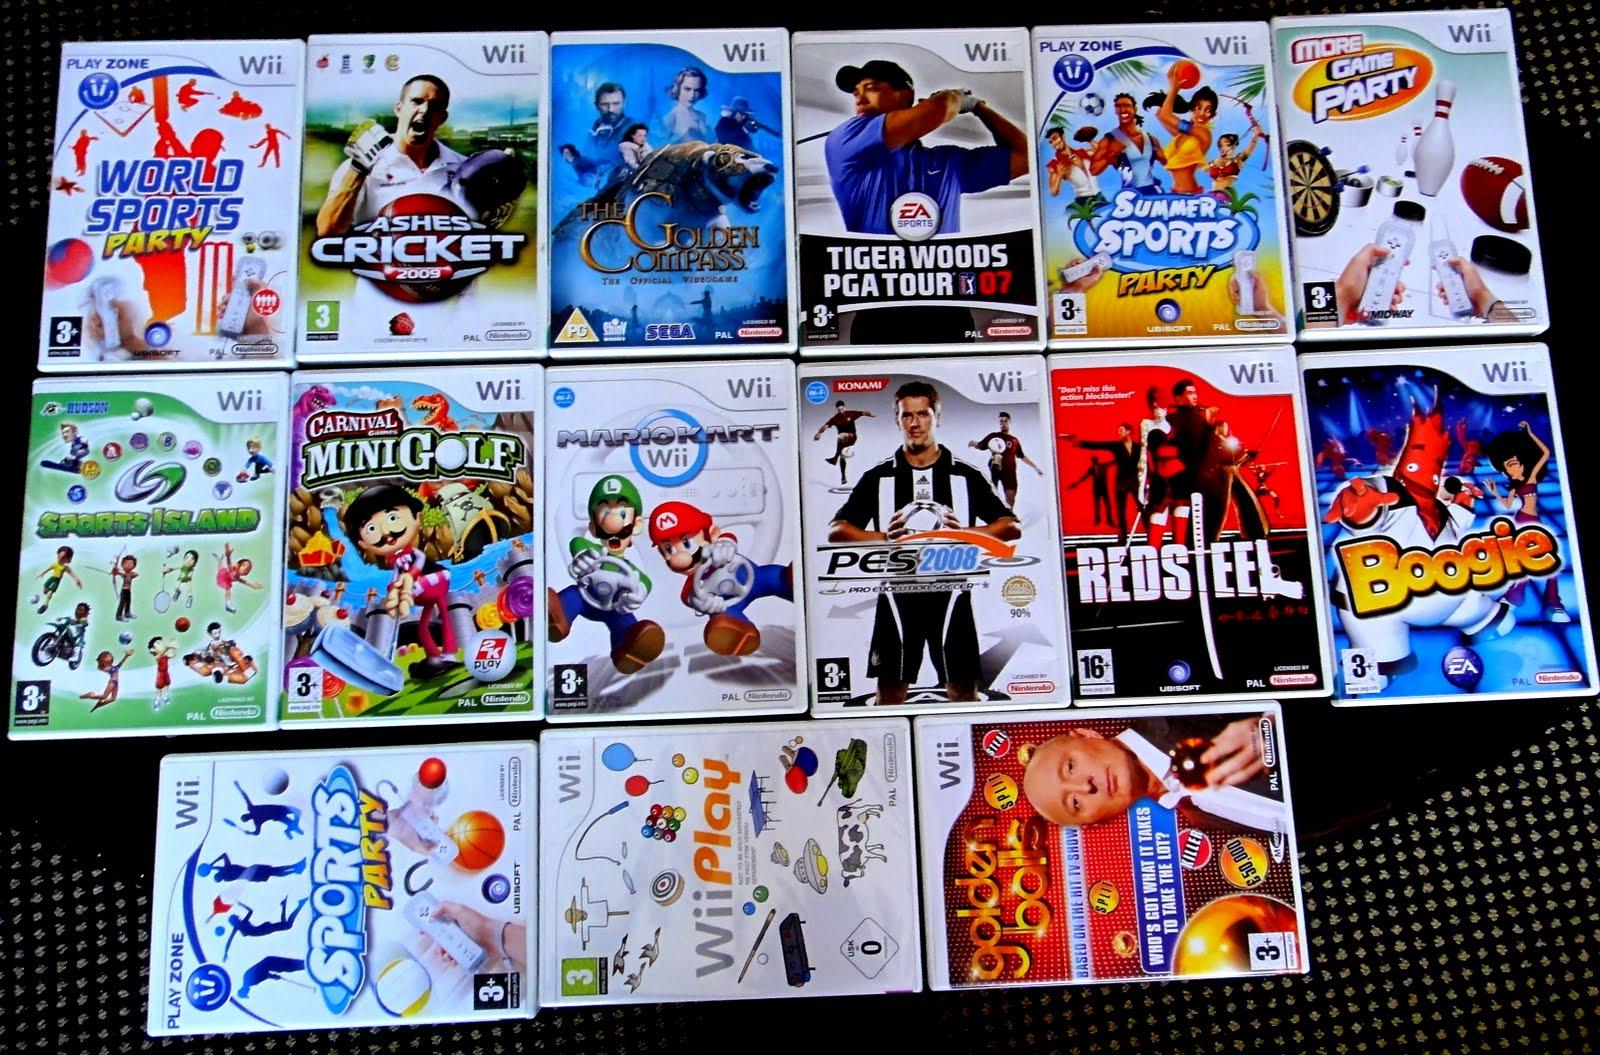 wii 4 player games list